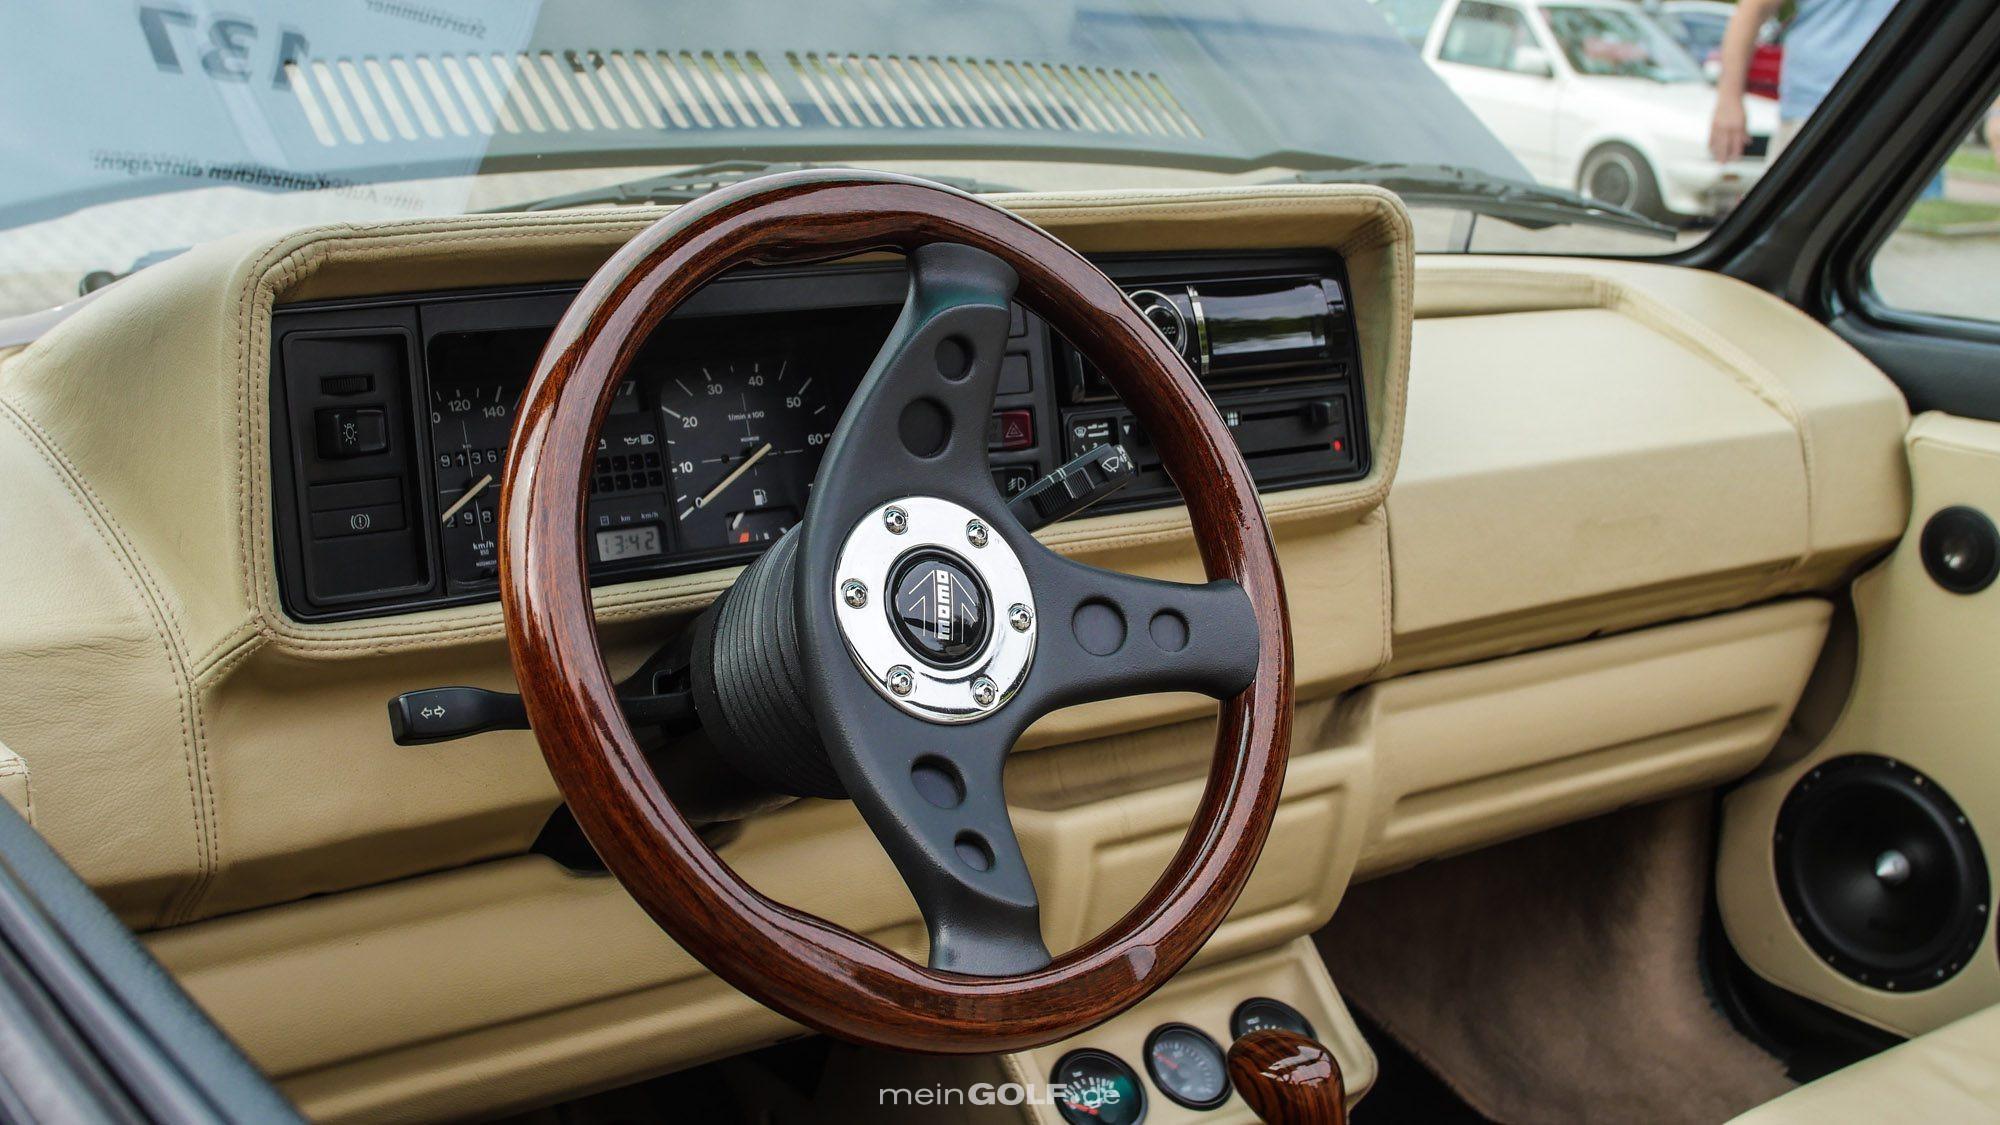 Stilvoll belederter Innenraum des VW Golf Cabrio